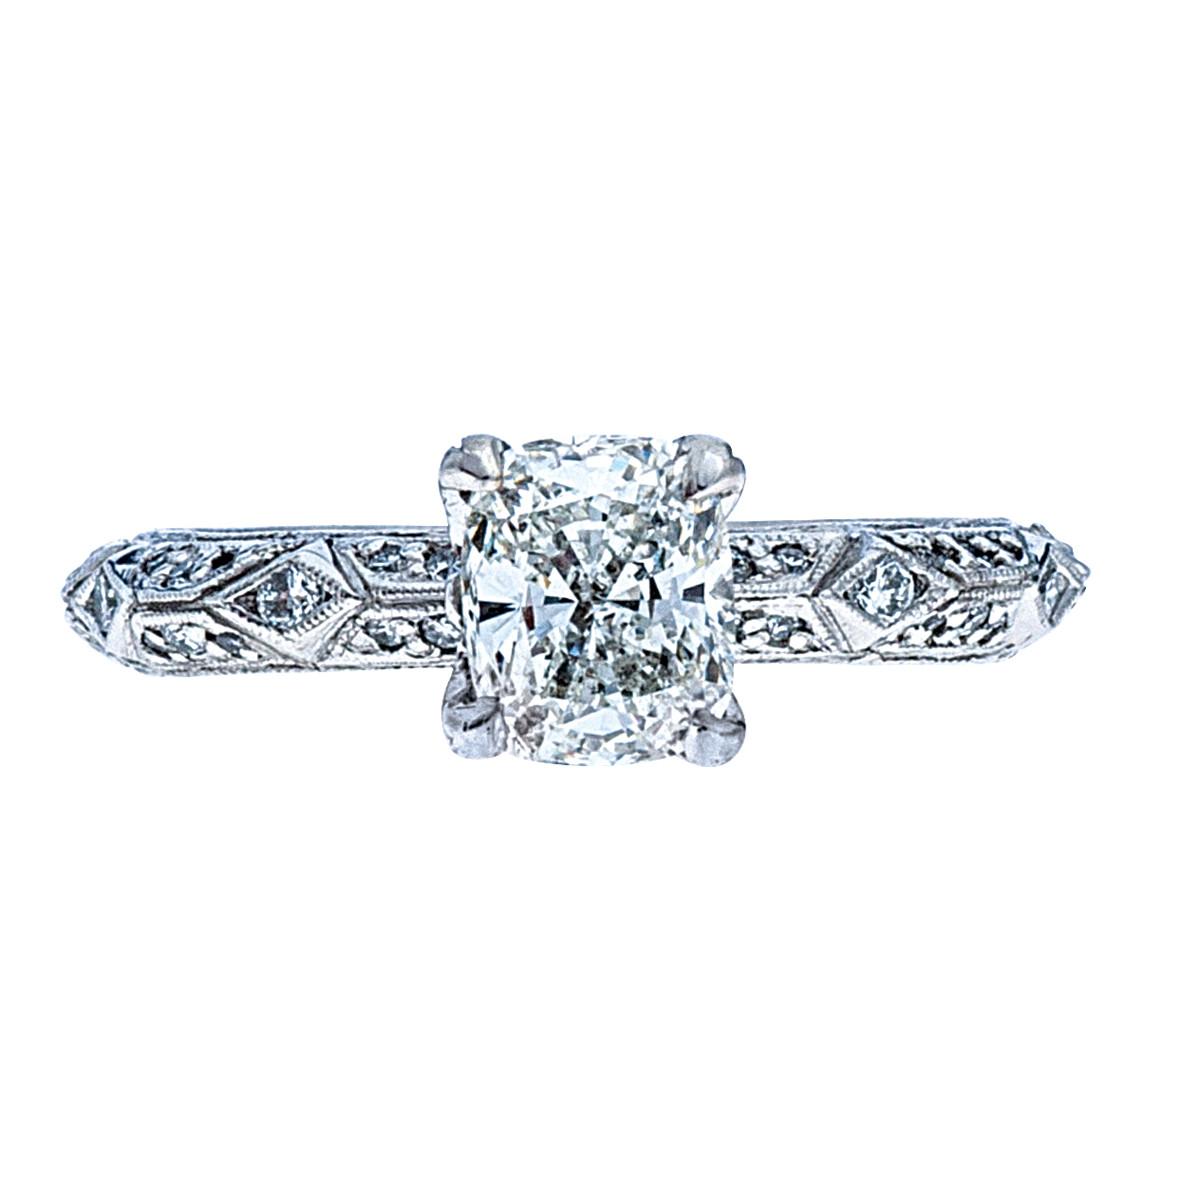 Vintage Tacori 1.32 CTW Diamond Engagement Ring